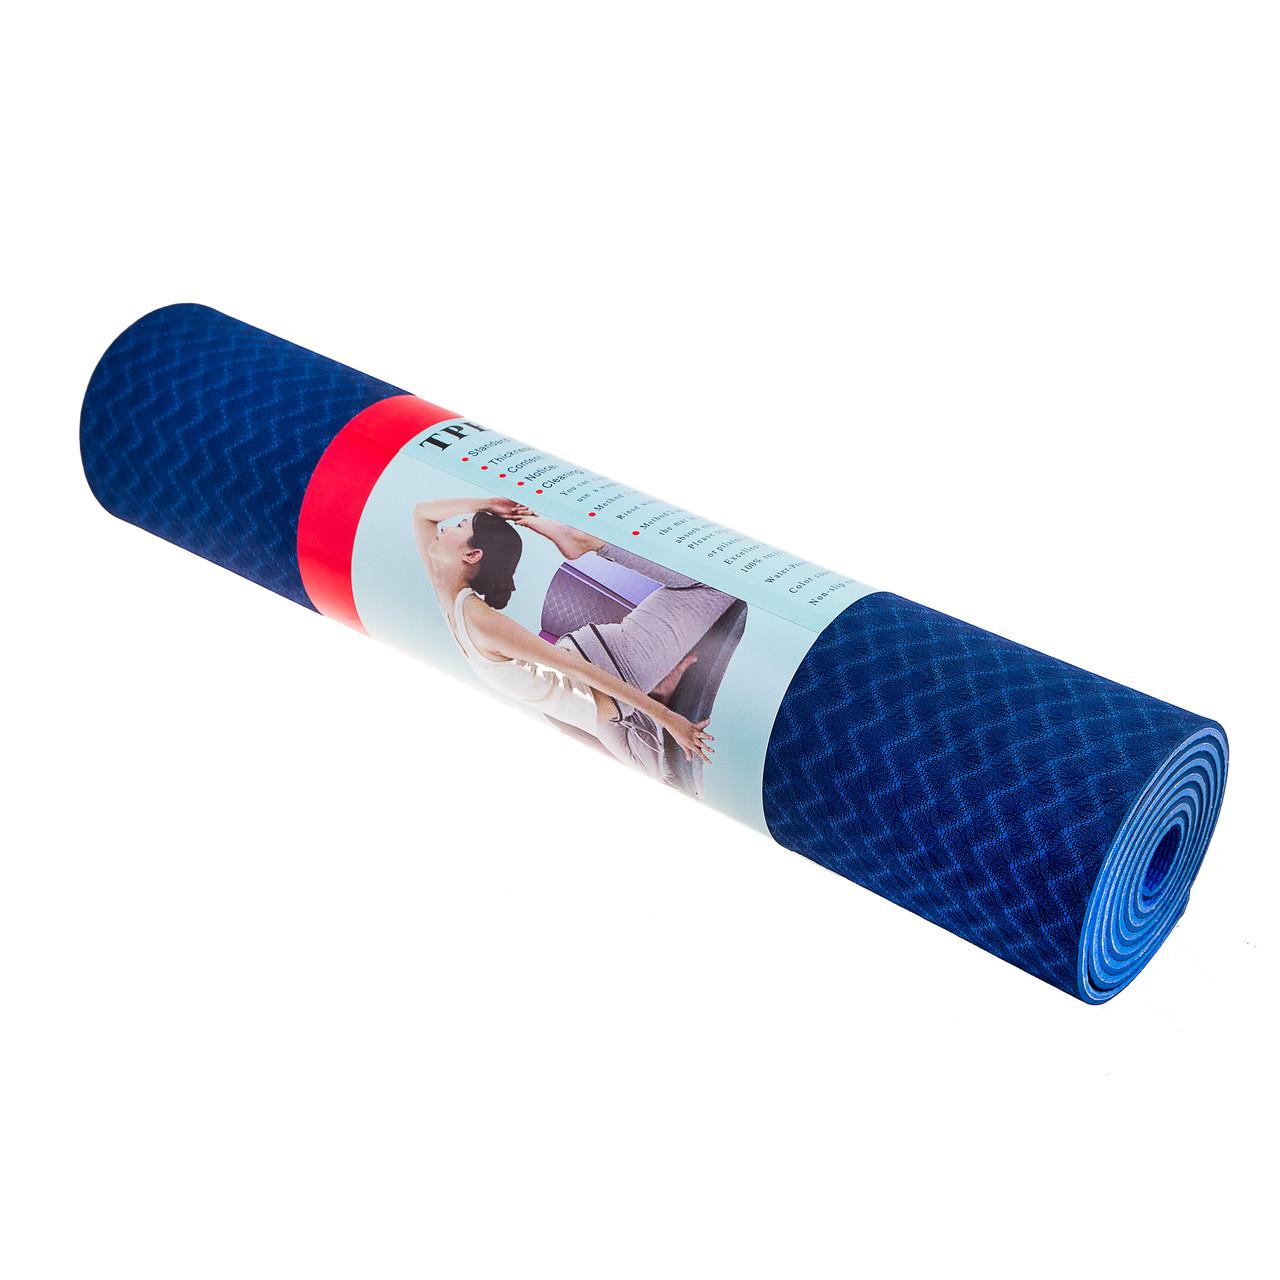 Коврик для фитнеса Yoga mat 6мм. (JPE) 183*61*0,6см 25580-2